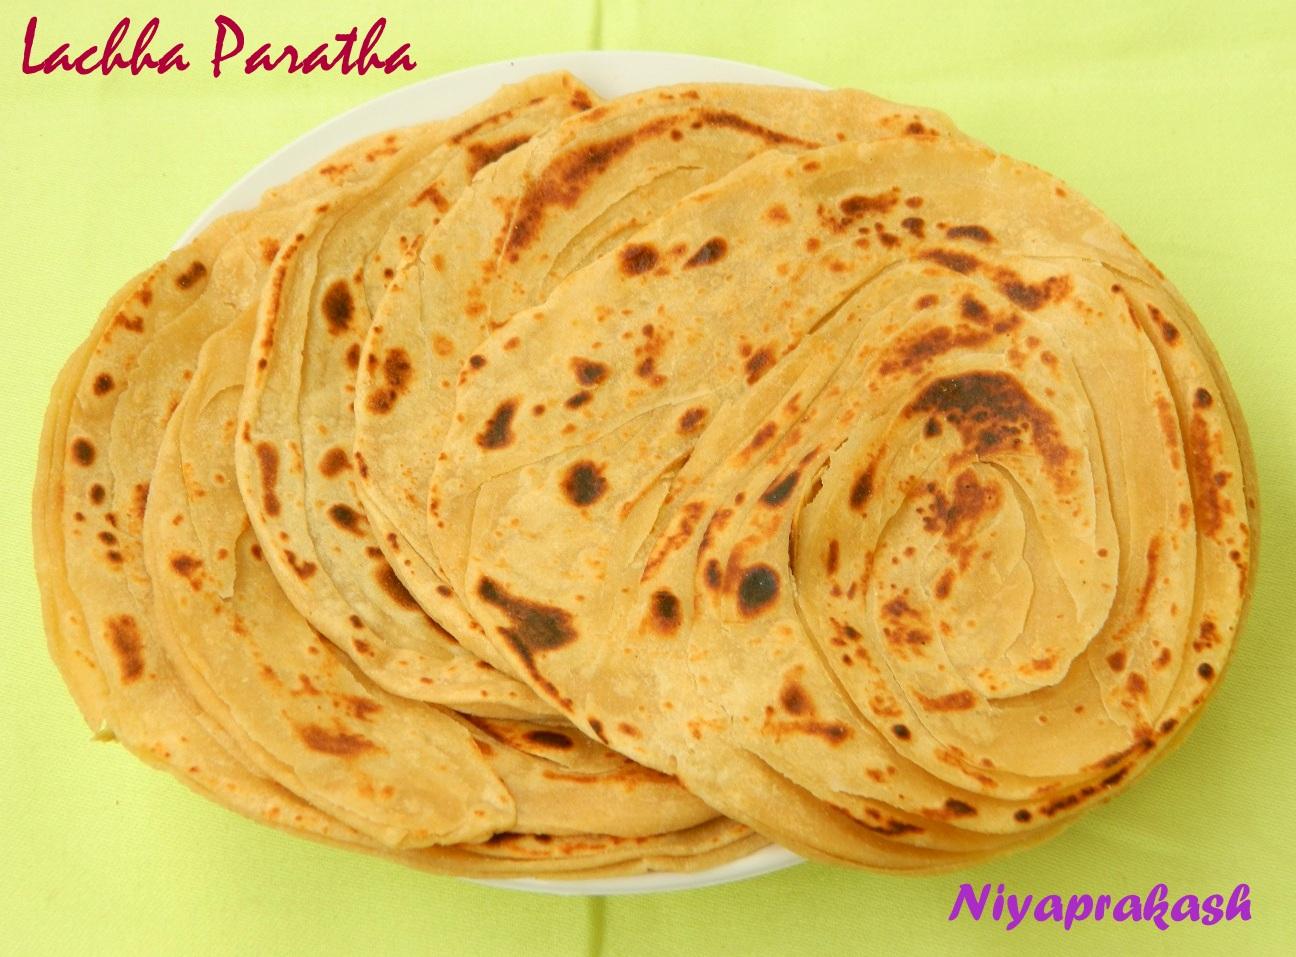 niyas world lachha paratha with egg